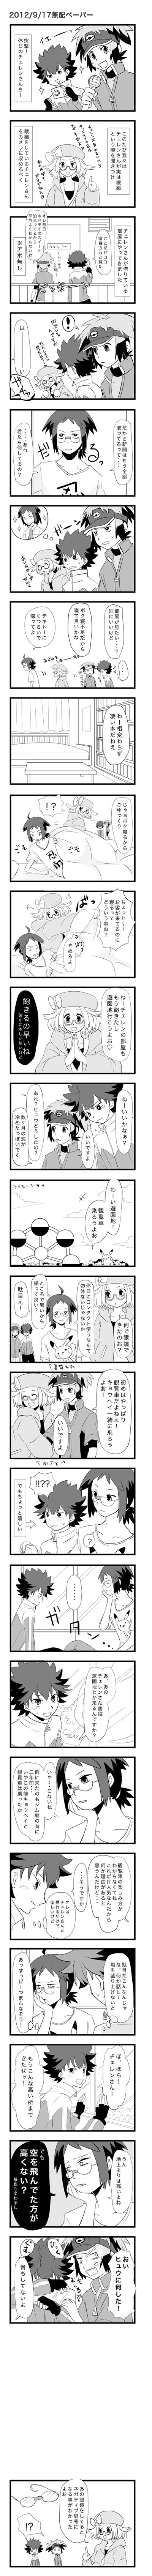 Tags: Anime, Pixiv Id 750545, Black and White 2, Pokémon, Kyouhei, Bel (Pokémon), Hue, Cheren (Pokémon), Pikachu, Ferris Wheel, Pixiv, Comic, Translation Request